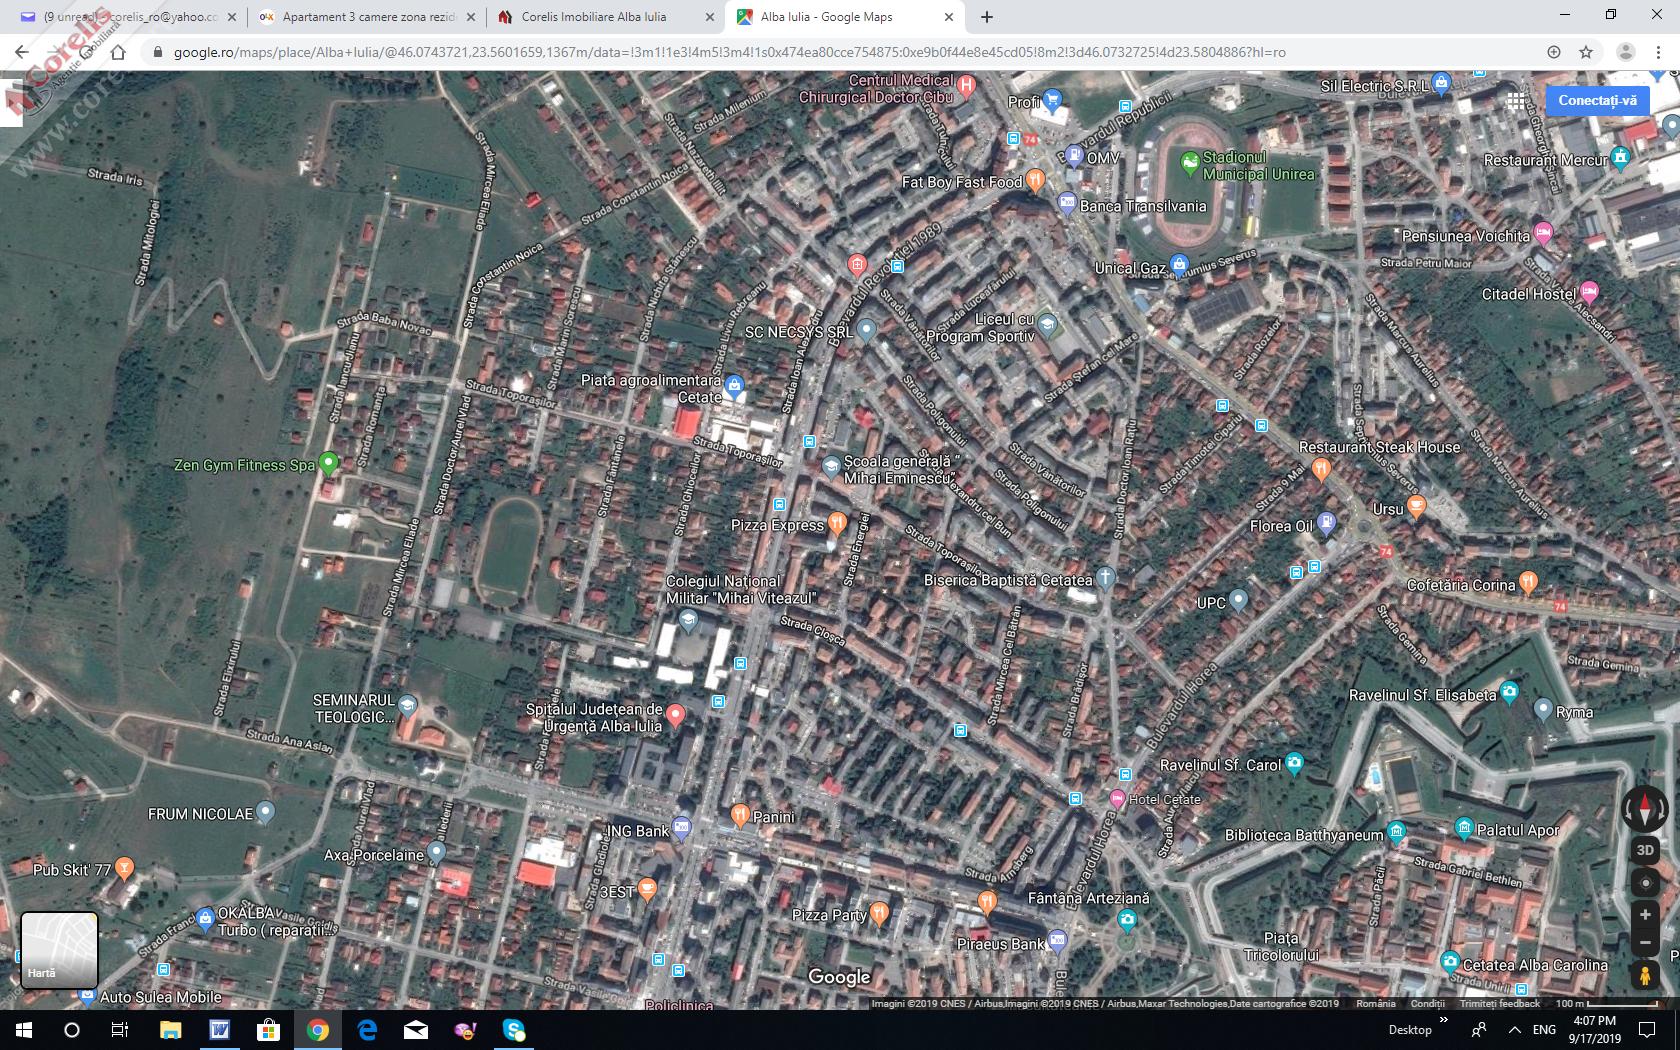 Teren in Alba Iulia